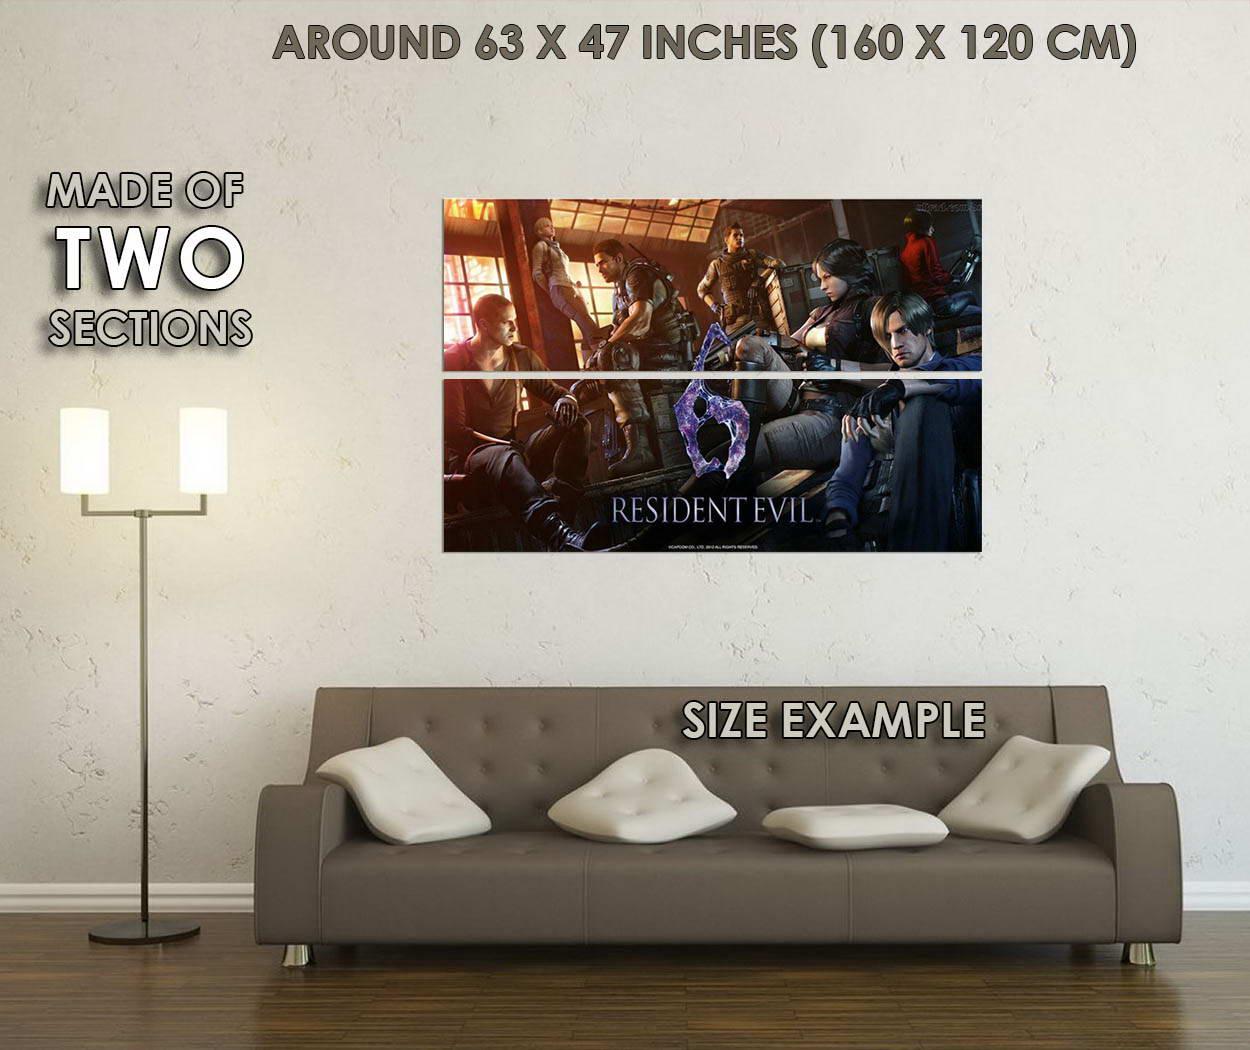 10545-Resident-Evil-6-Game-Leon-Scott-Kennedy-LAMINATED-POSTER-CA thumbnail 6